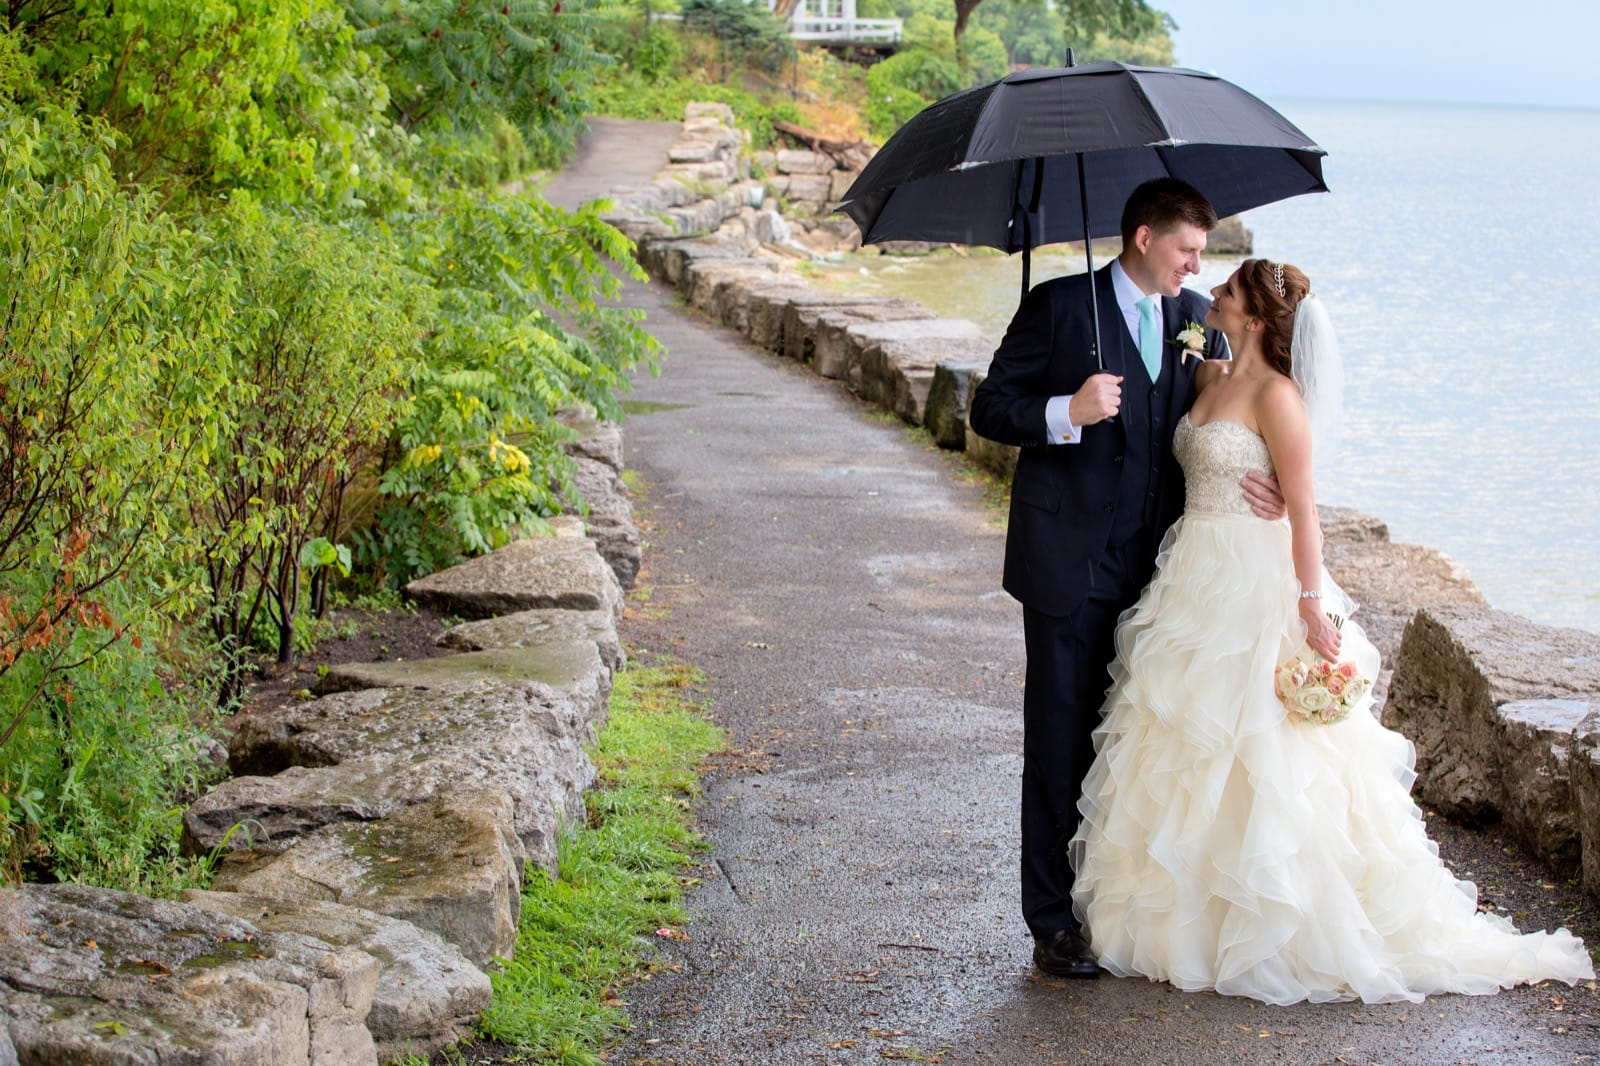 Oakville wedding photography on a rainy day